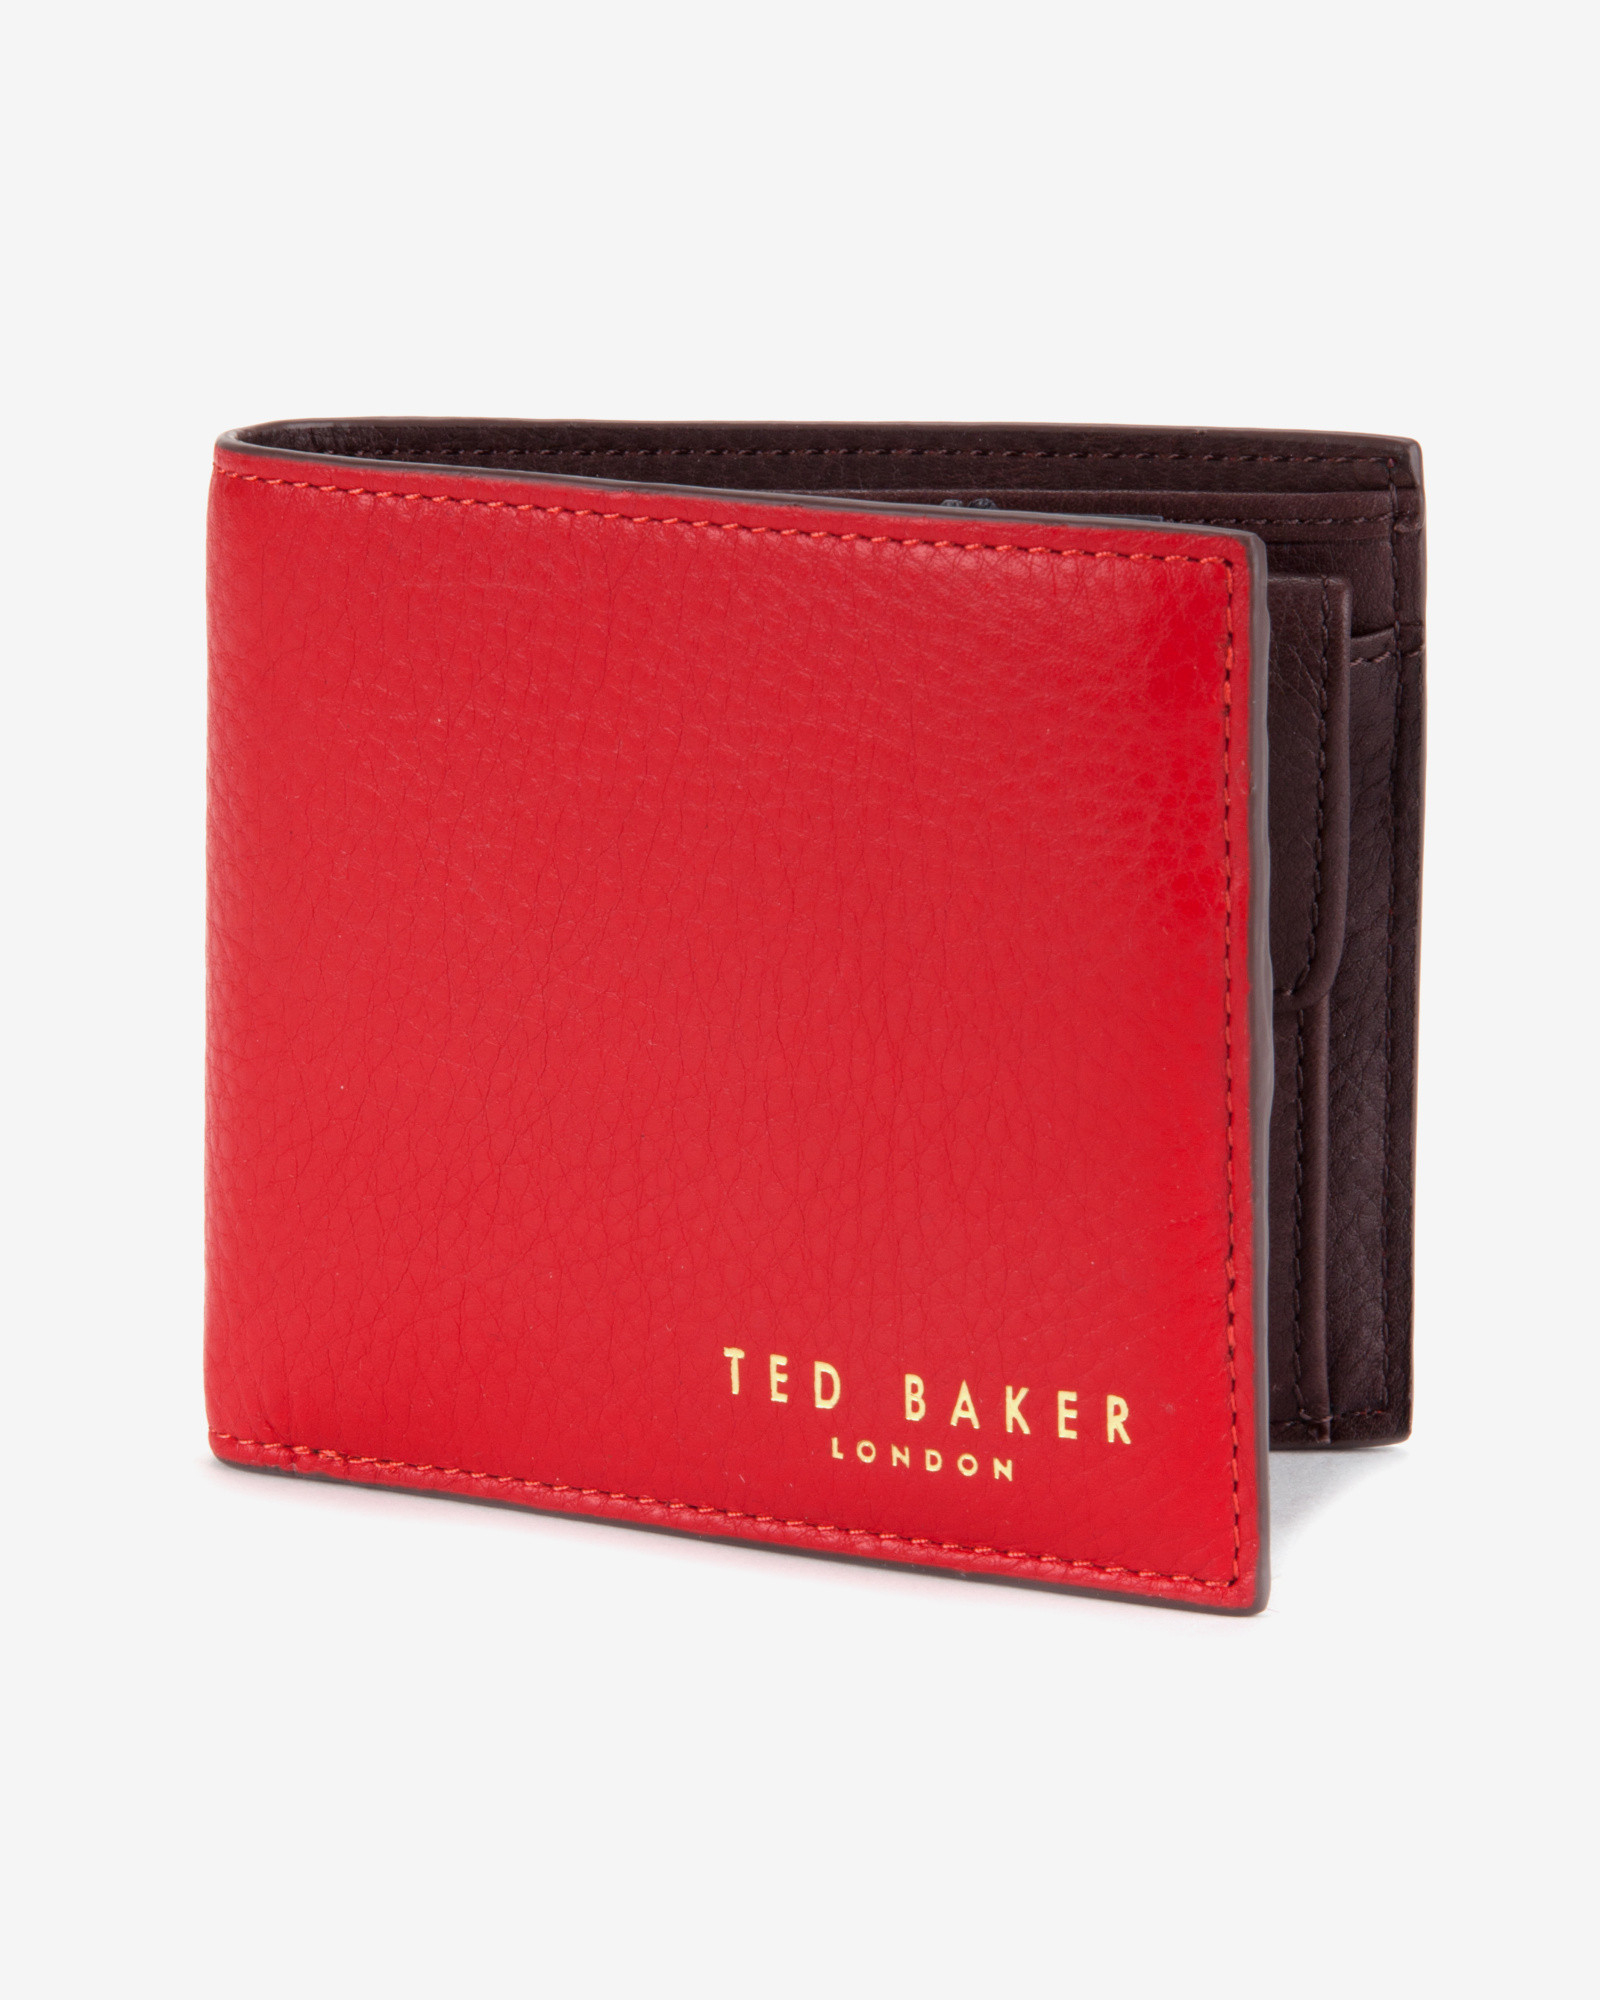 b2b3b58501c4 Ted Baker Men S Wallets Canada - Best Photo Wallet Justiceforkenny.Org